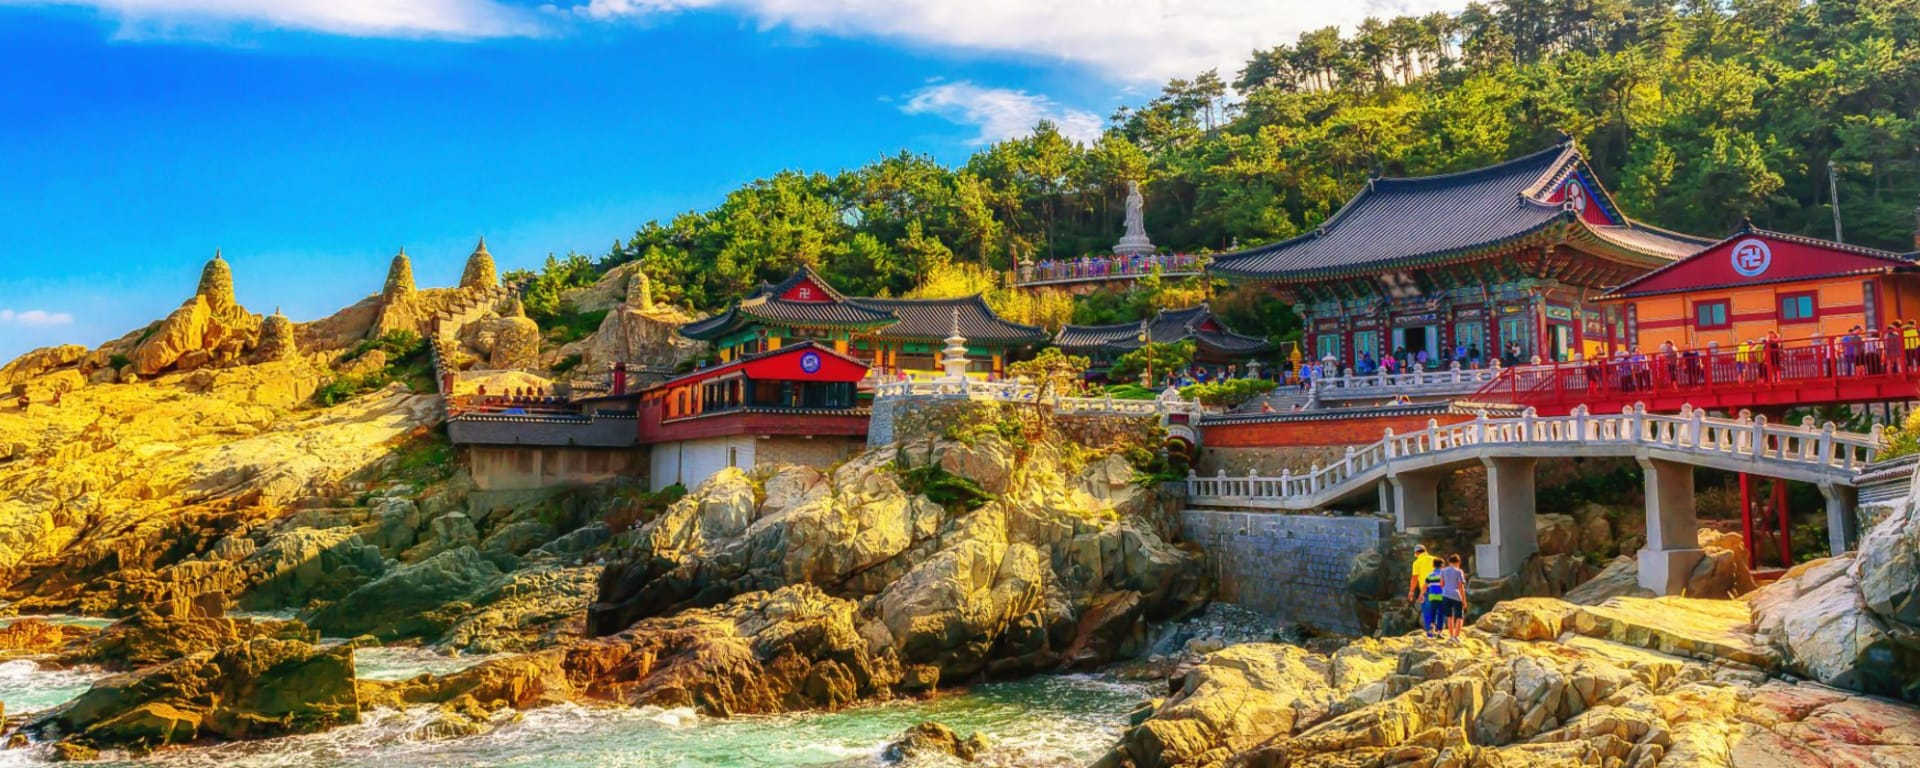 Corée du Sud compacte de Séoul: Haedong Yonggungsa Temple and Haeundae Sea in Busan